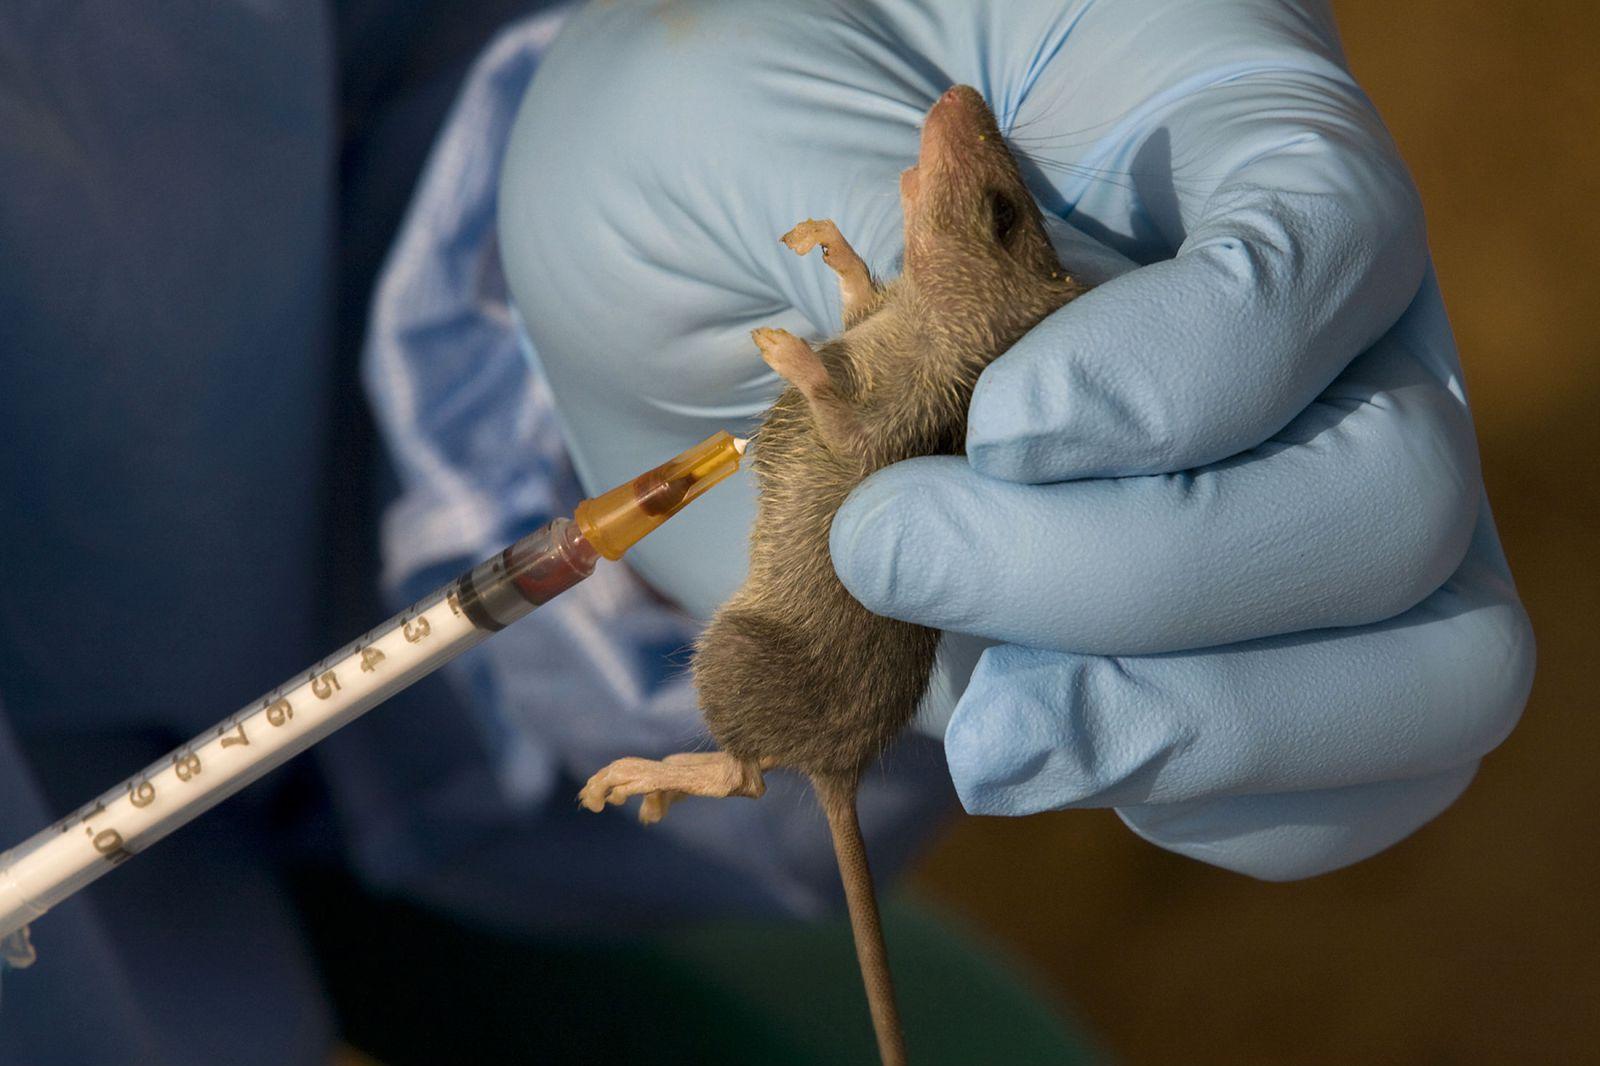 Nuevo virus en Brasil causa la primera muerte por fiebre hemorrágica